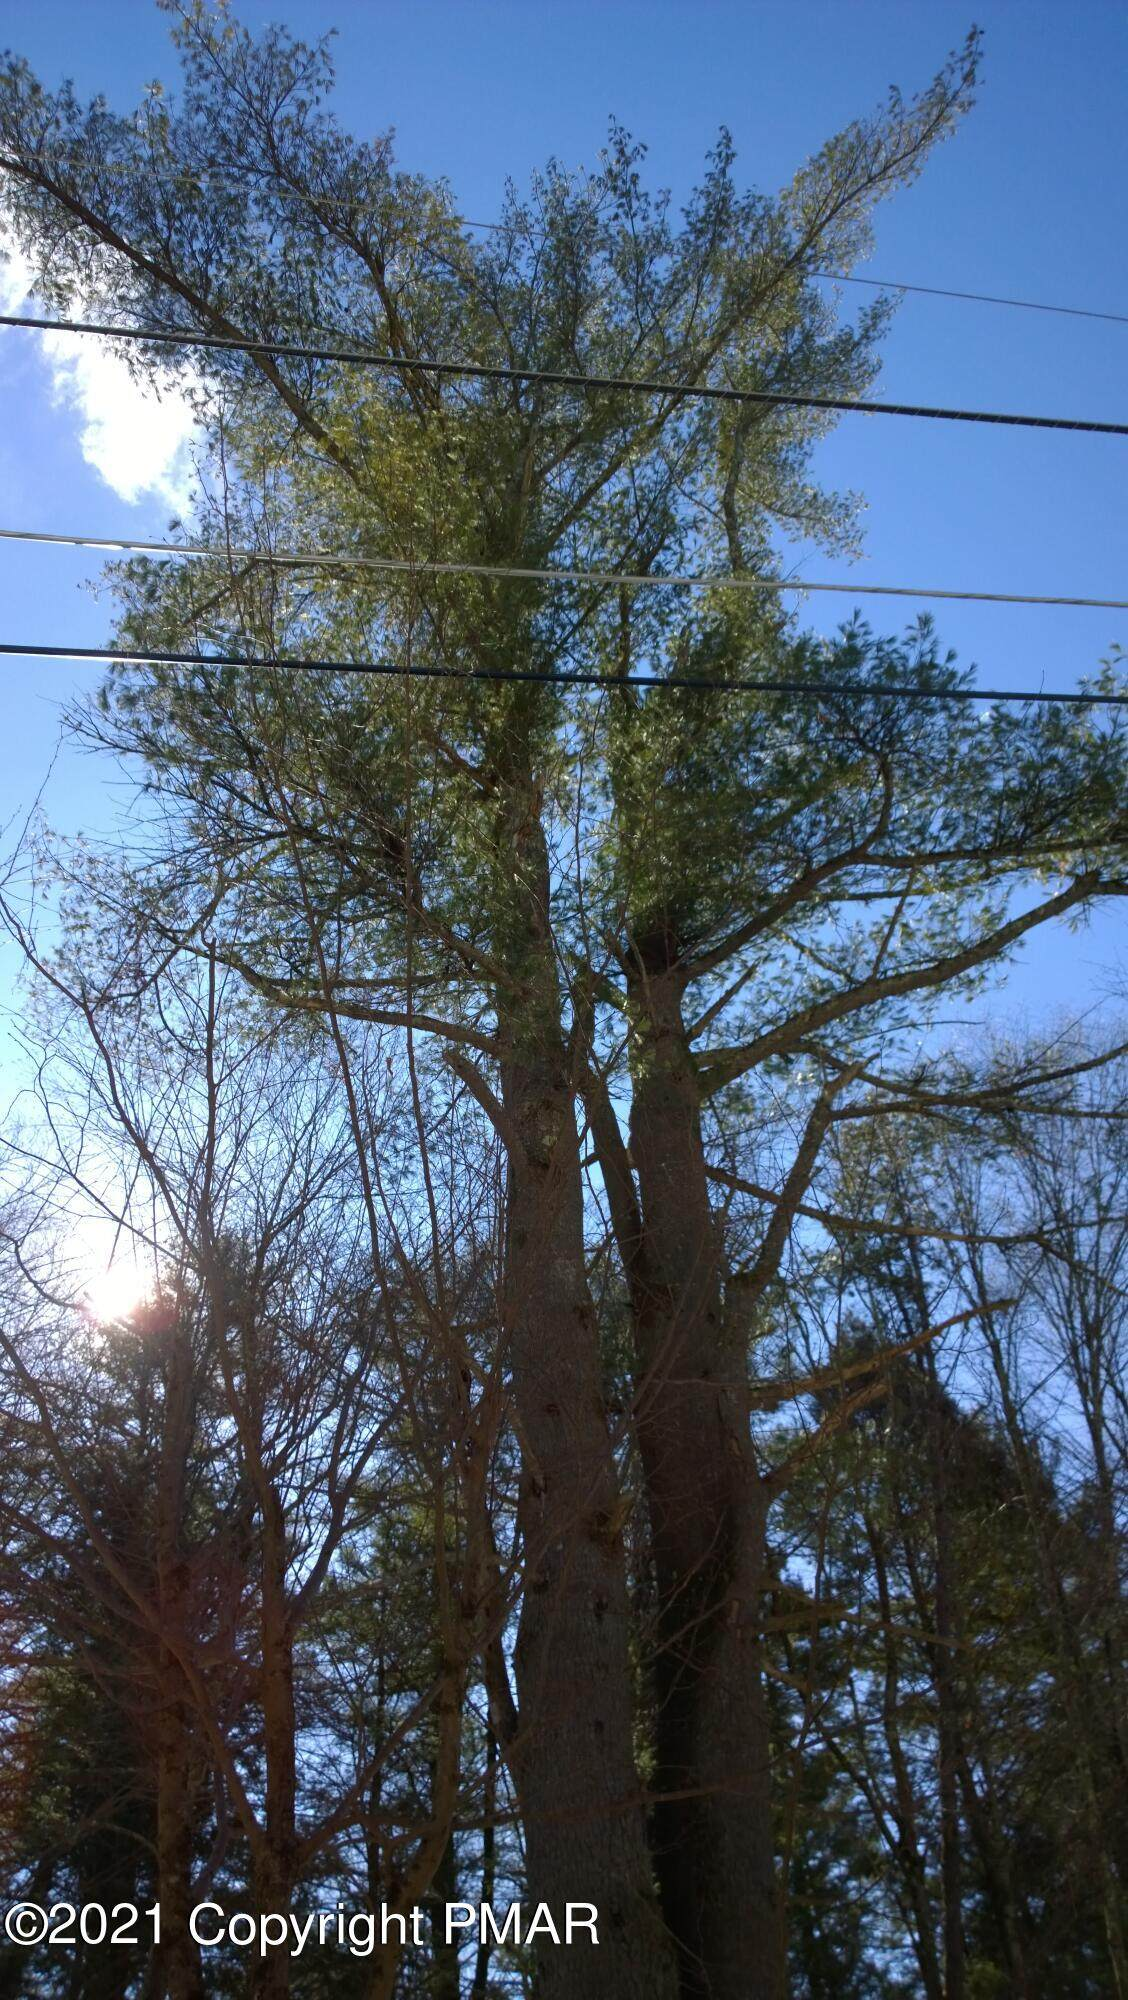 Lot 675 Raccoon Ct - Photo 1